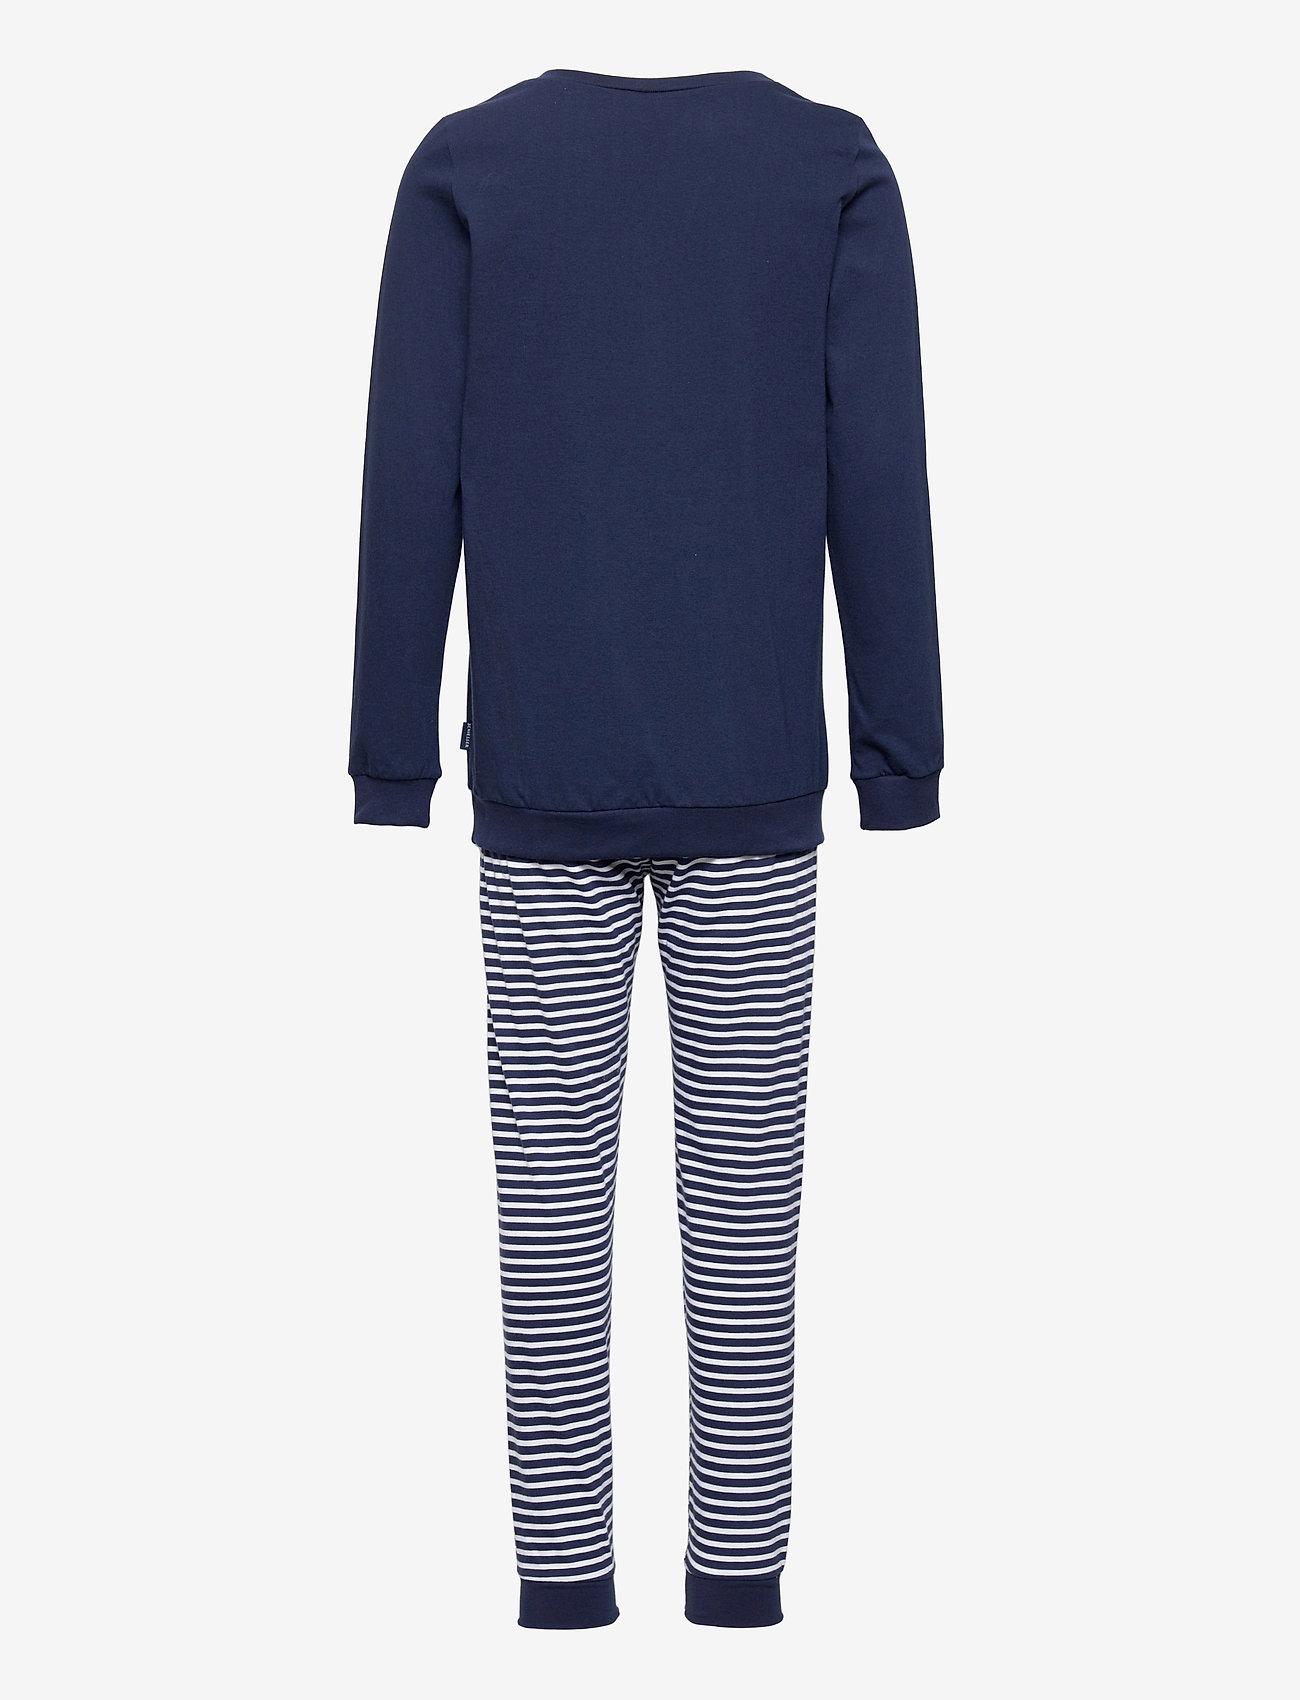 Schiesser - Boys Pyjama Long - sets - dark blue - 1